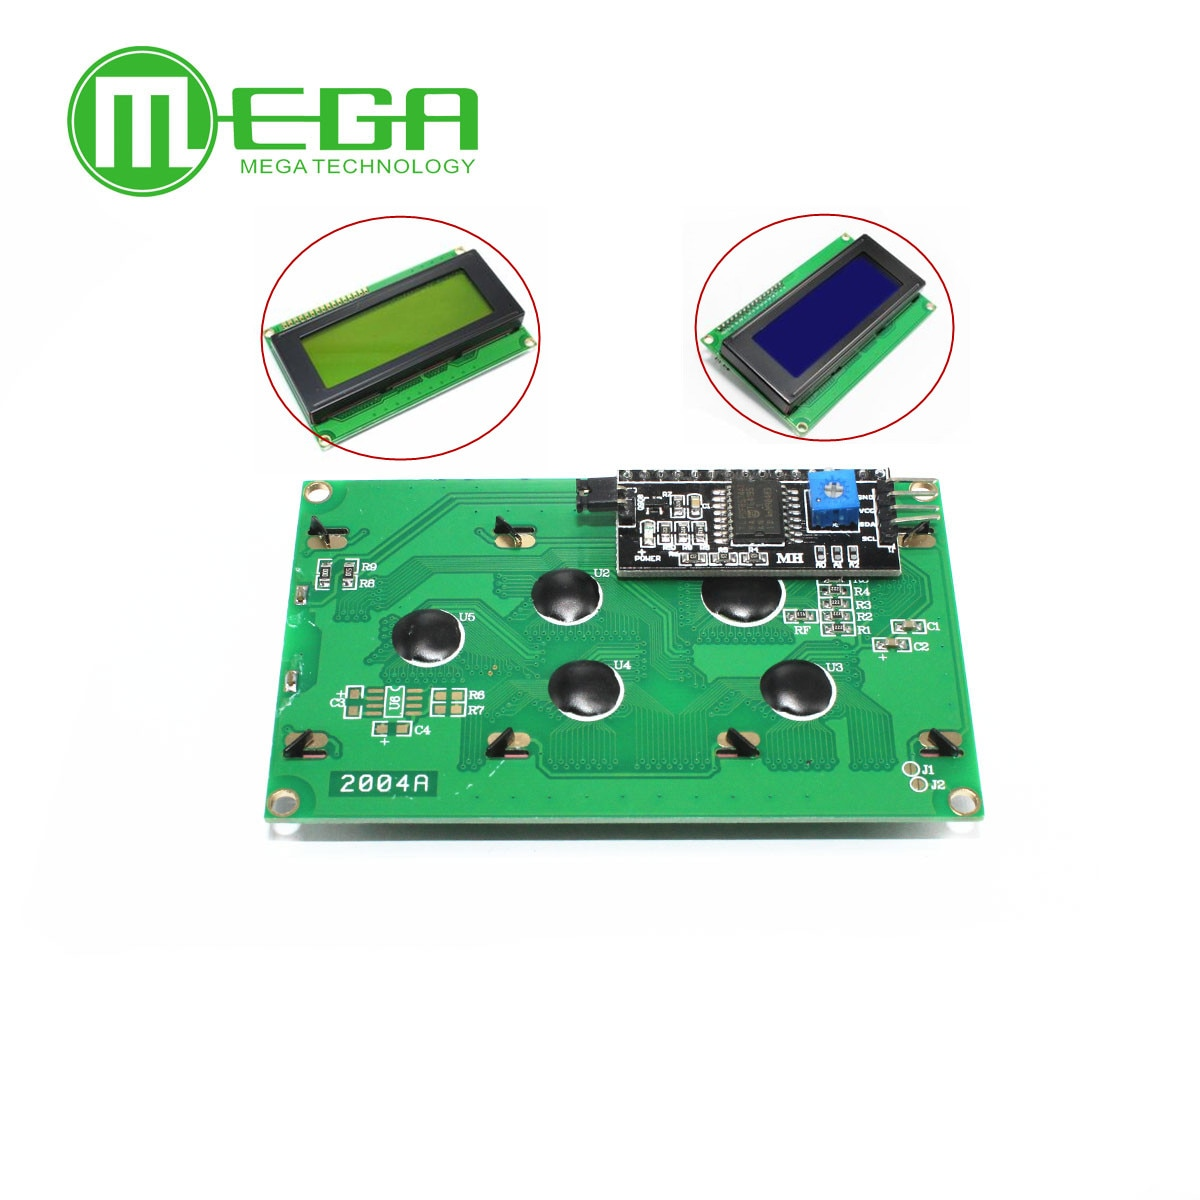 LCD 2004 + I2C 2004 20x4 2004A синий экран HD44780 для arduino символ LCD /w IIC/I2C серийный интерфейс адаптер модуль